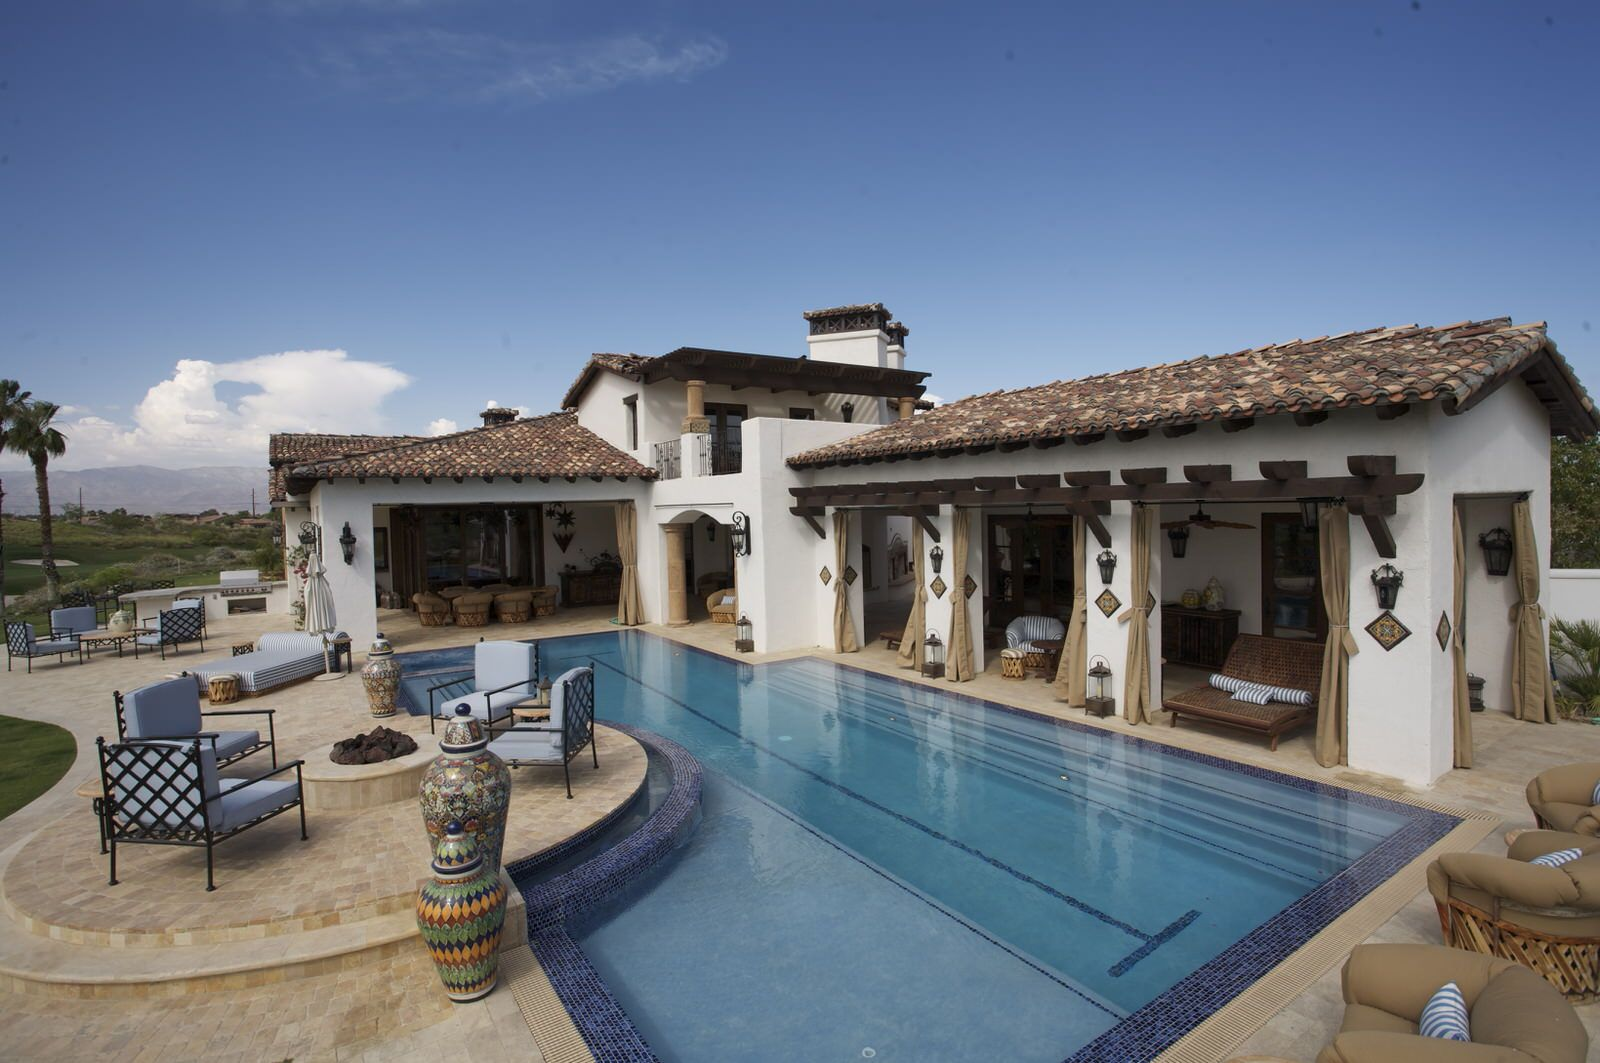 Mg 3678 Jpg California Pools Pool Outdoor Living